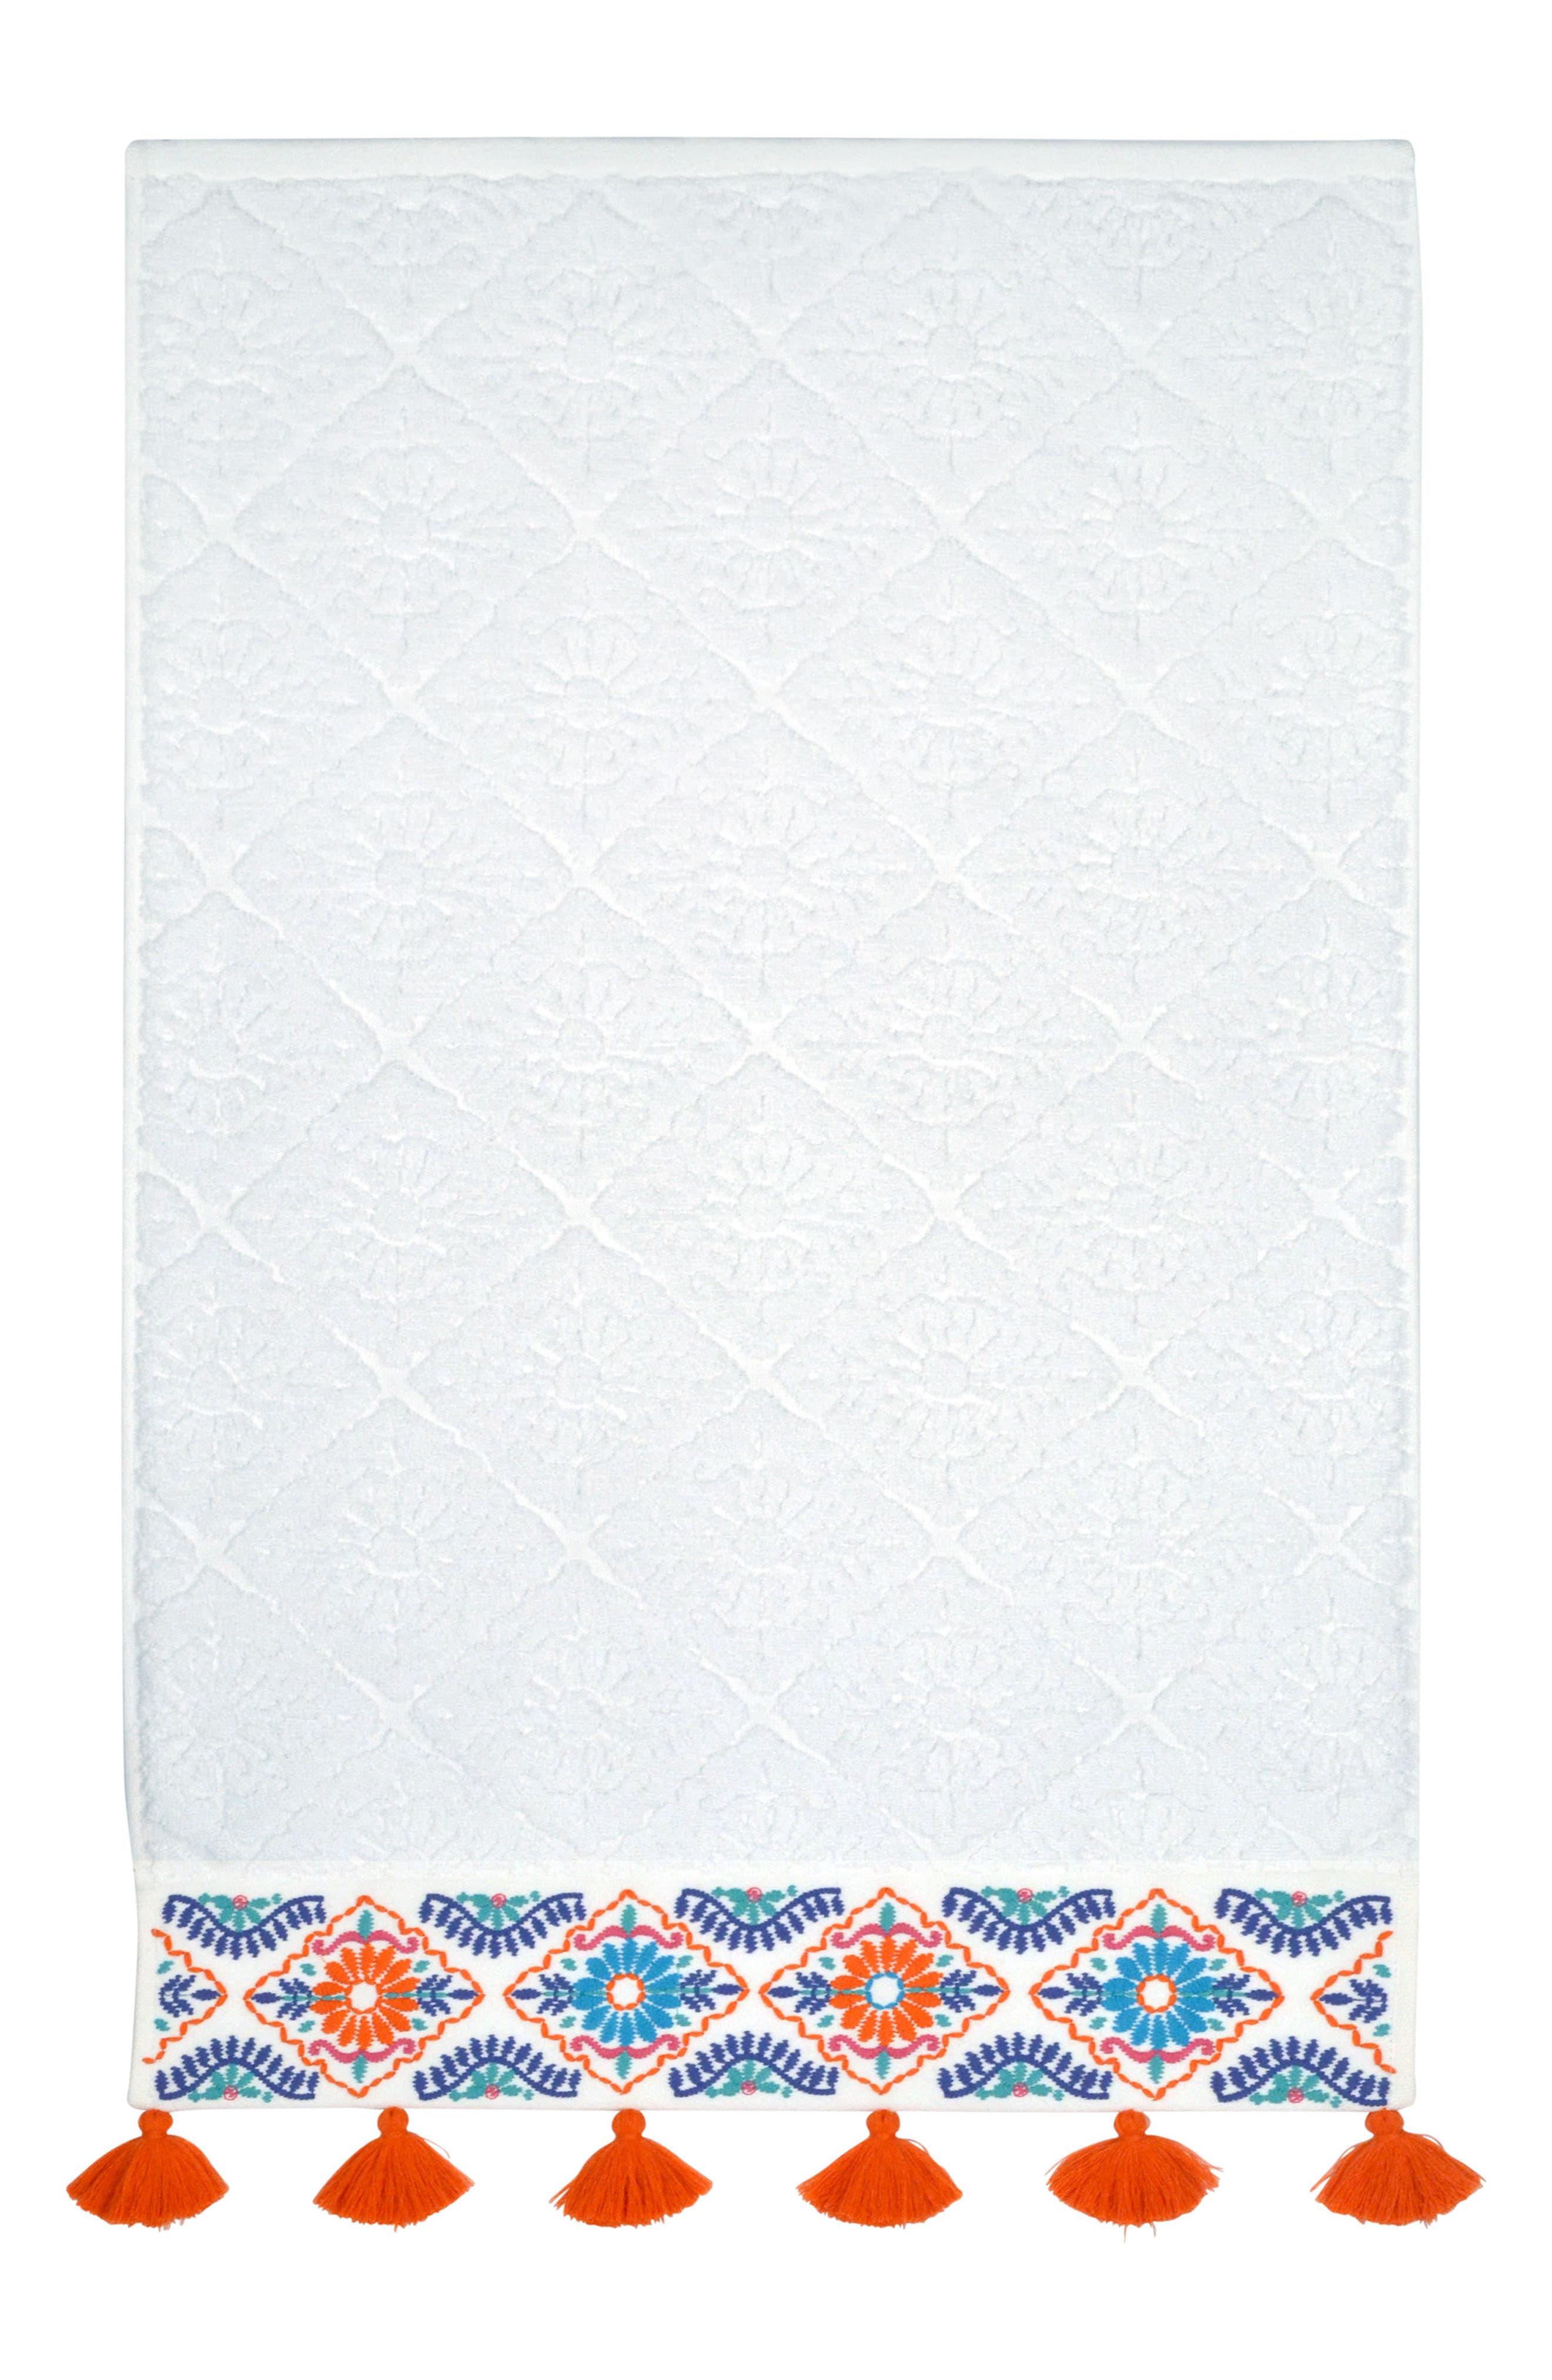 Alternate Image 1 Selected - John Robshaw Aloka Hand Towel